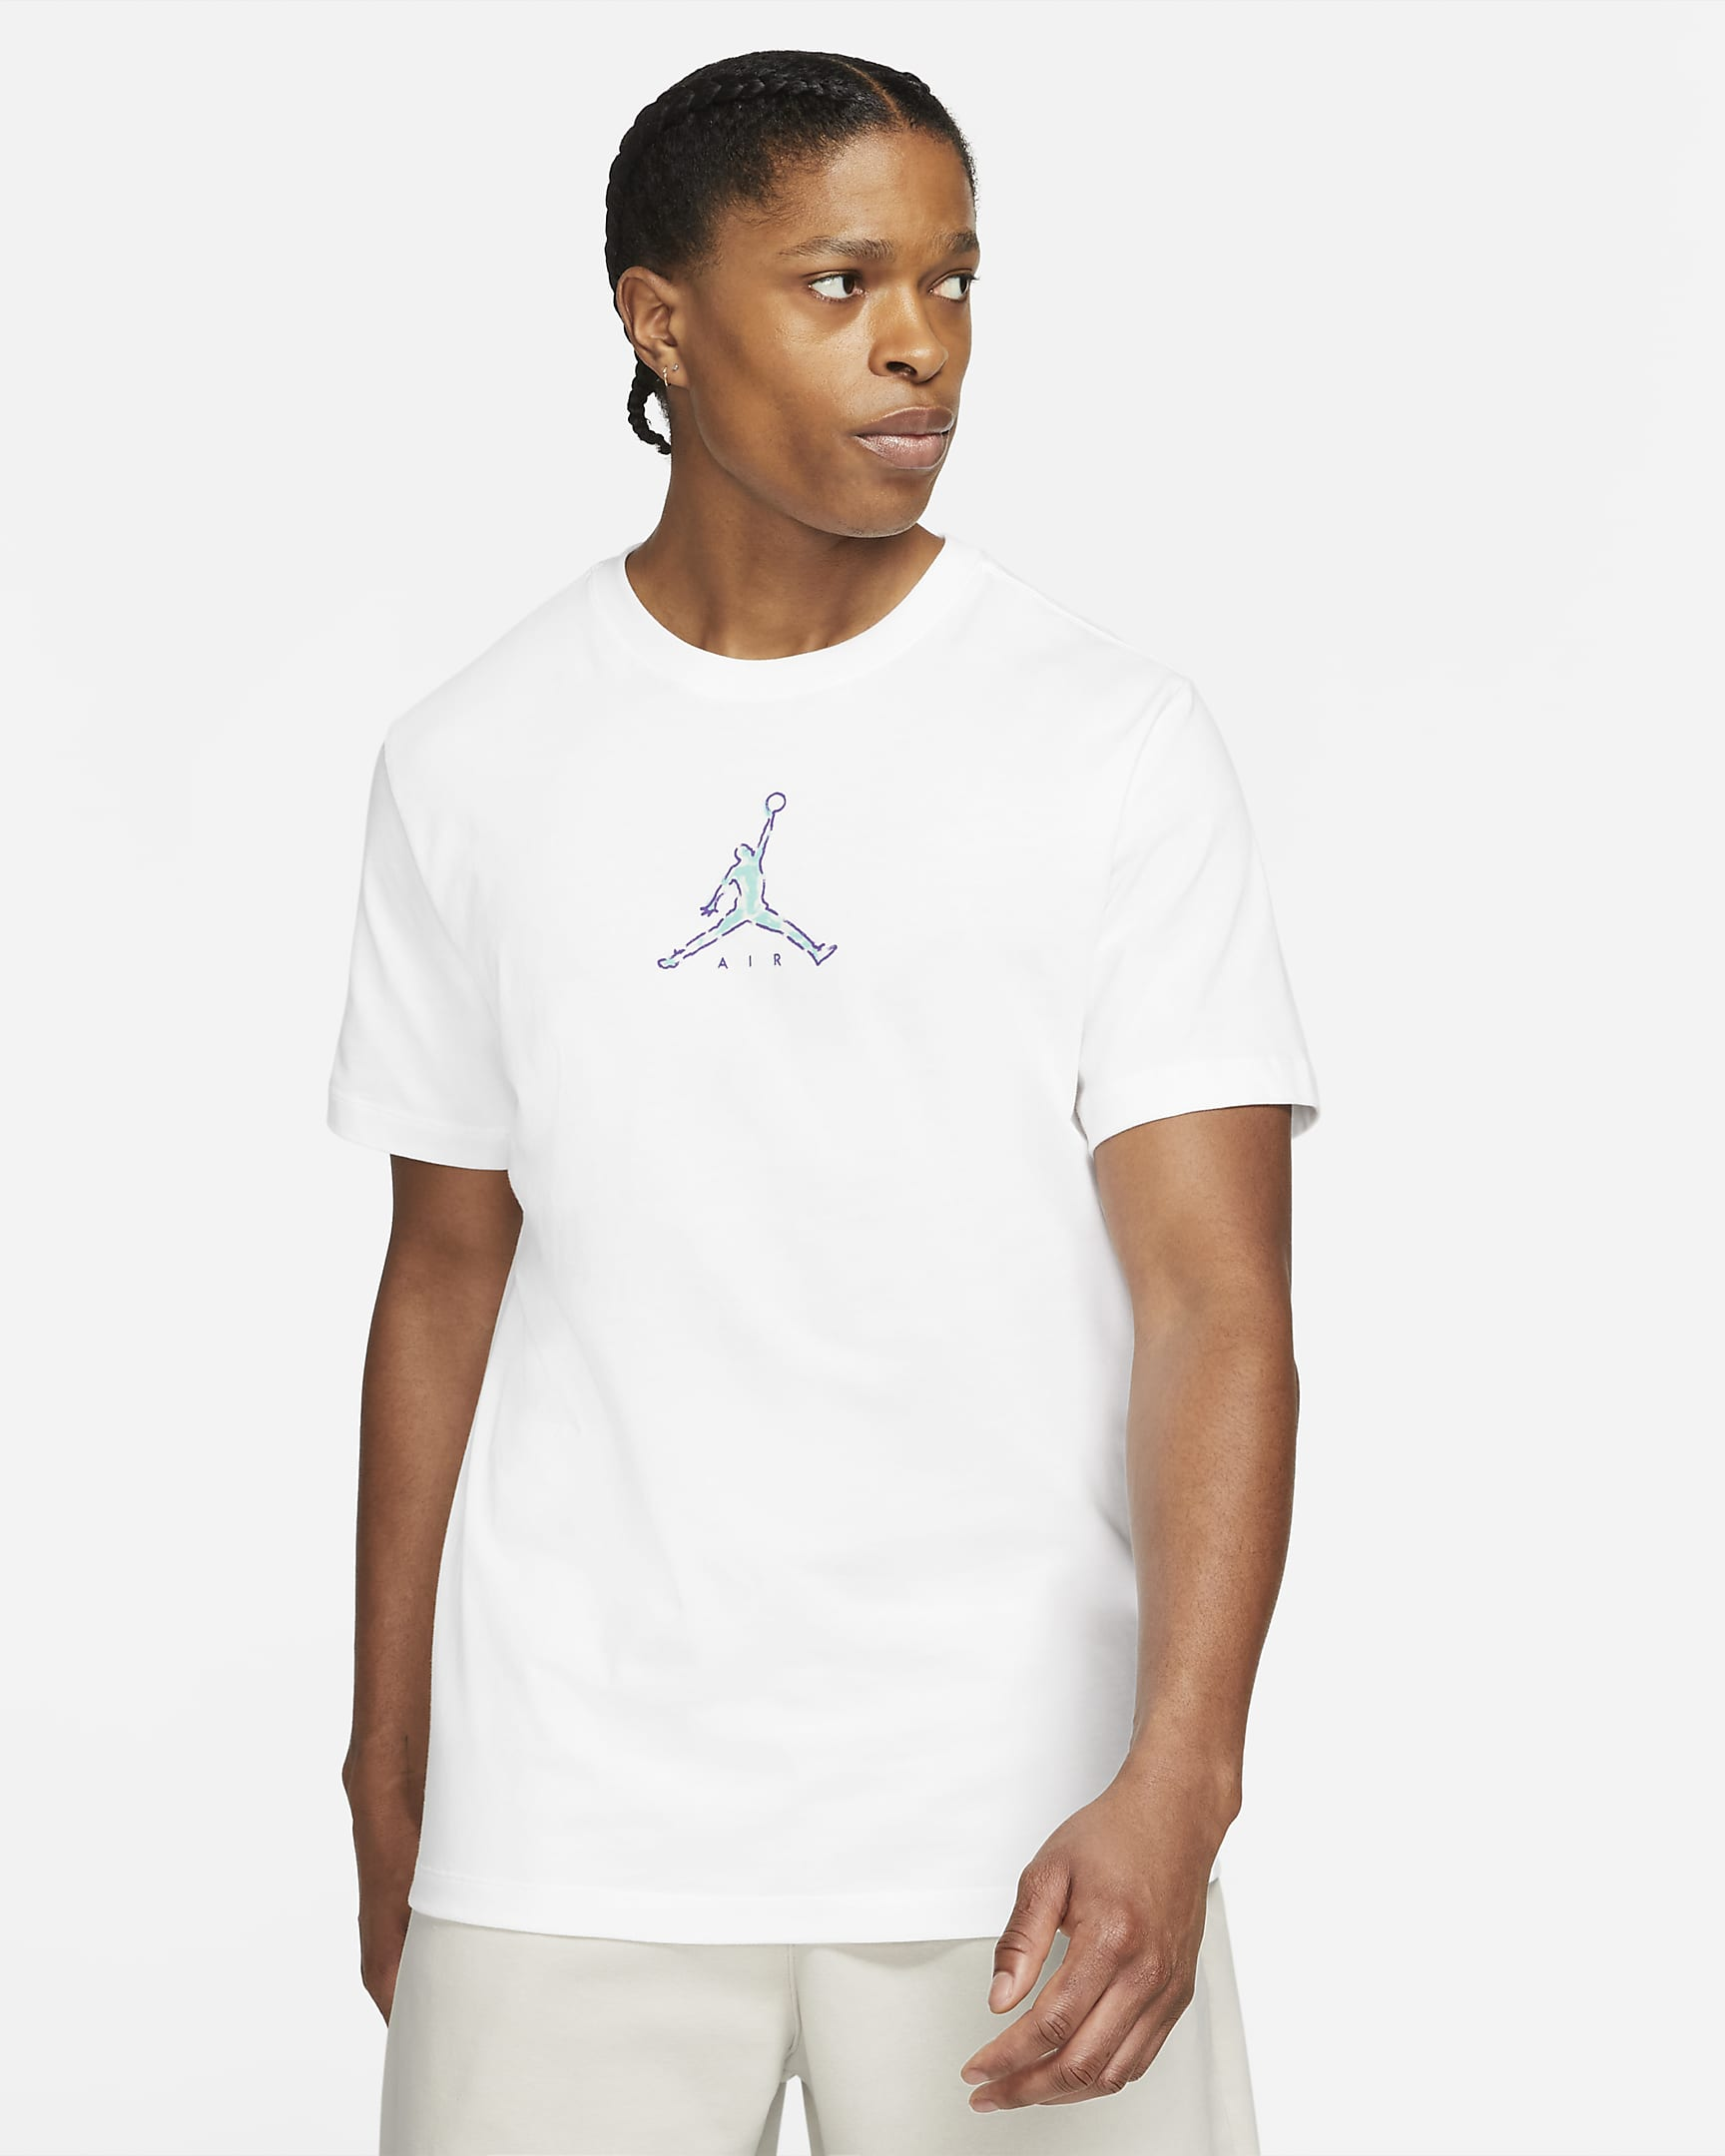 jordan-23-swoosh-mens-short-sleeve-t-shirt-2nxH4t.png